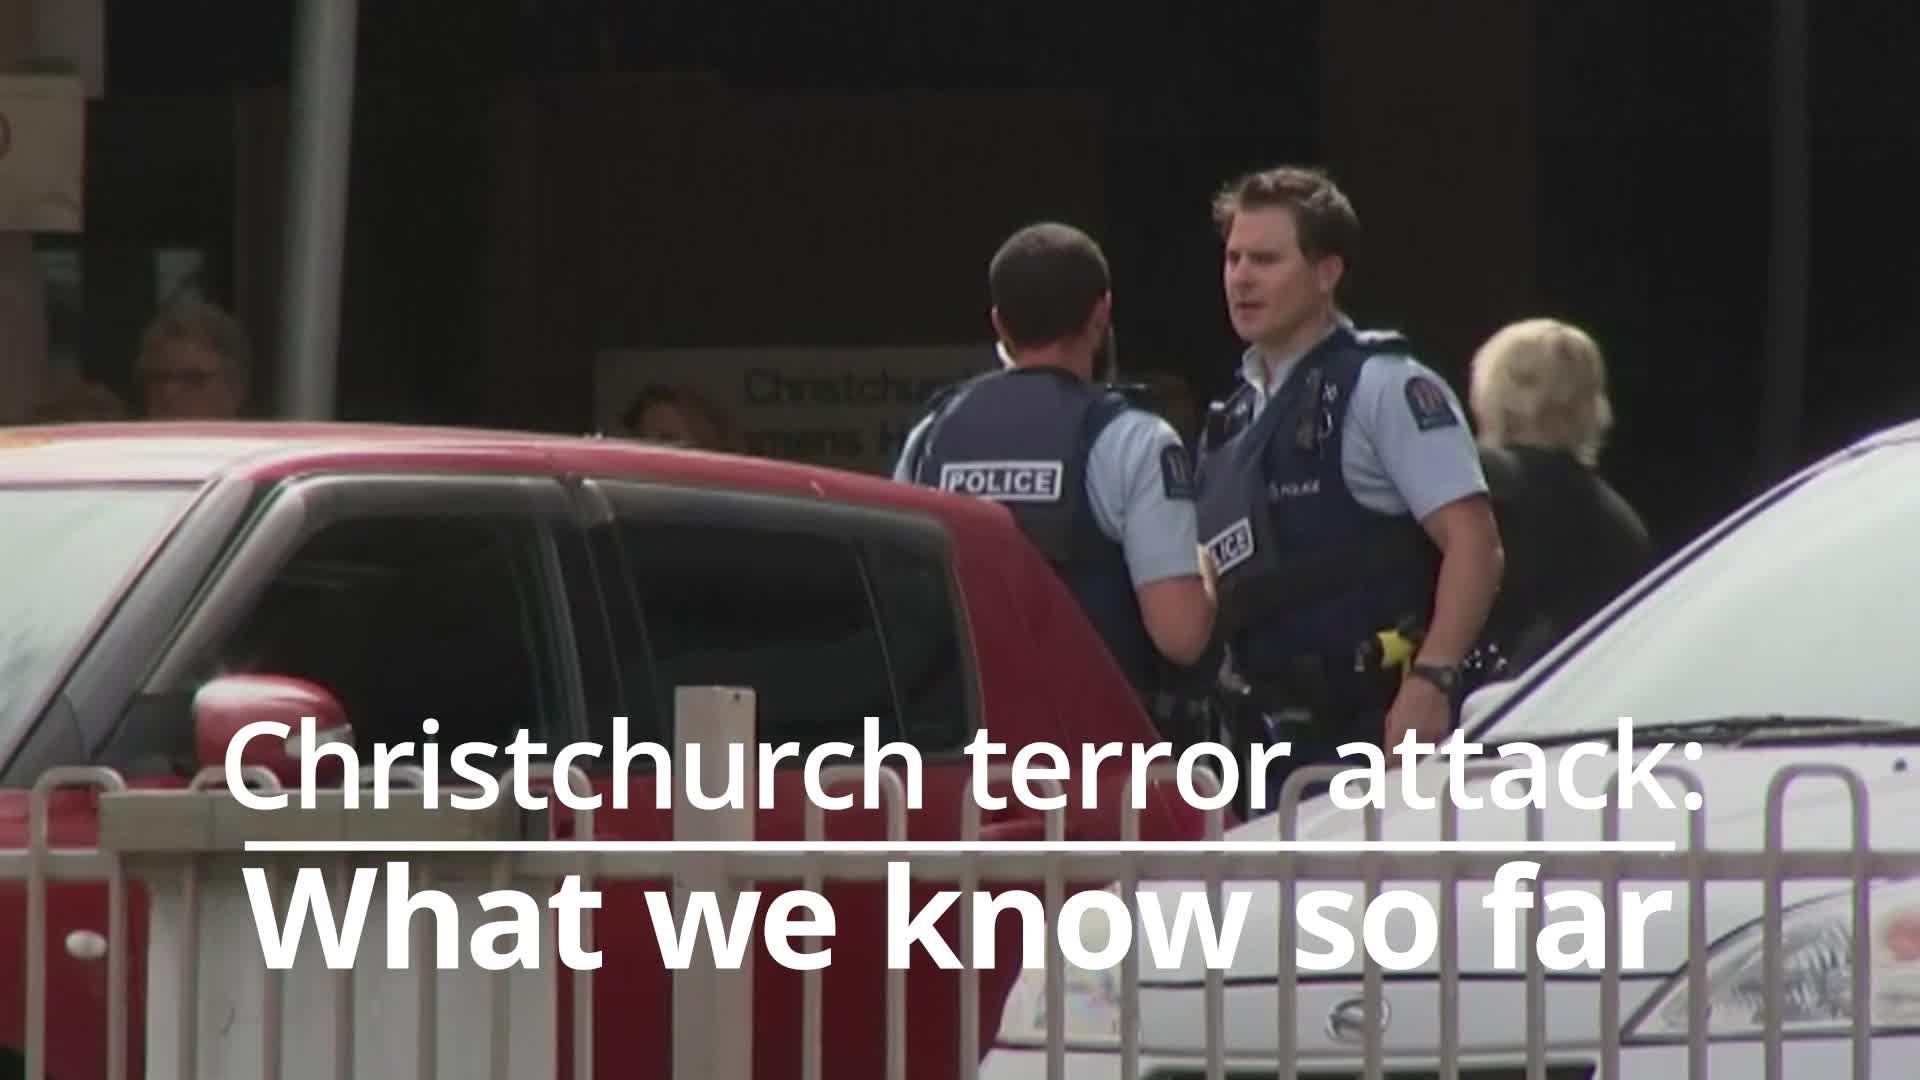 New Zealand Mosque Shooting Updates Imran Khan Blames: News On Flipboard By HuffPost UK